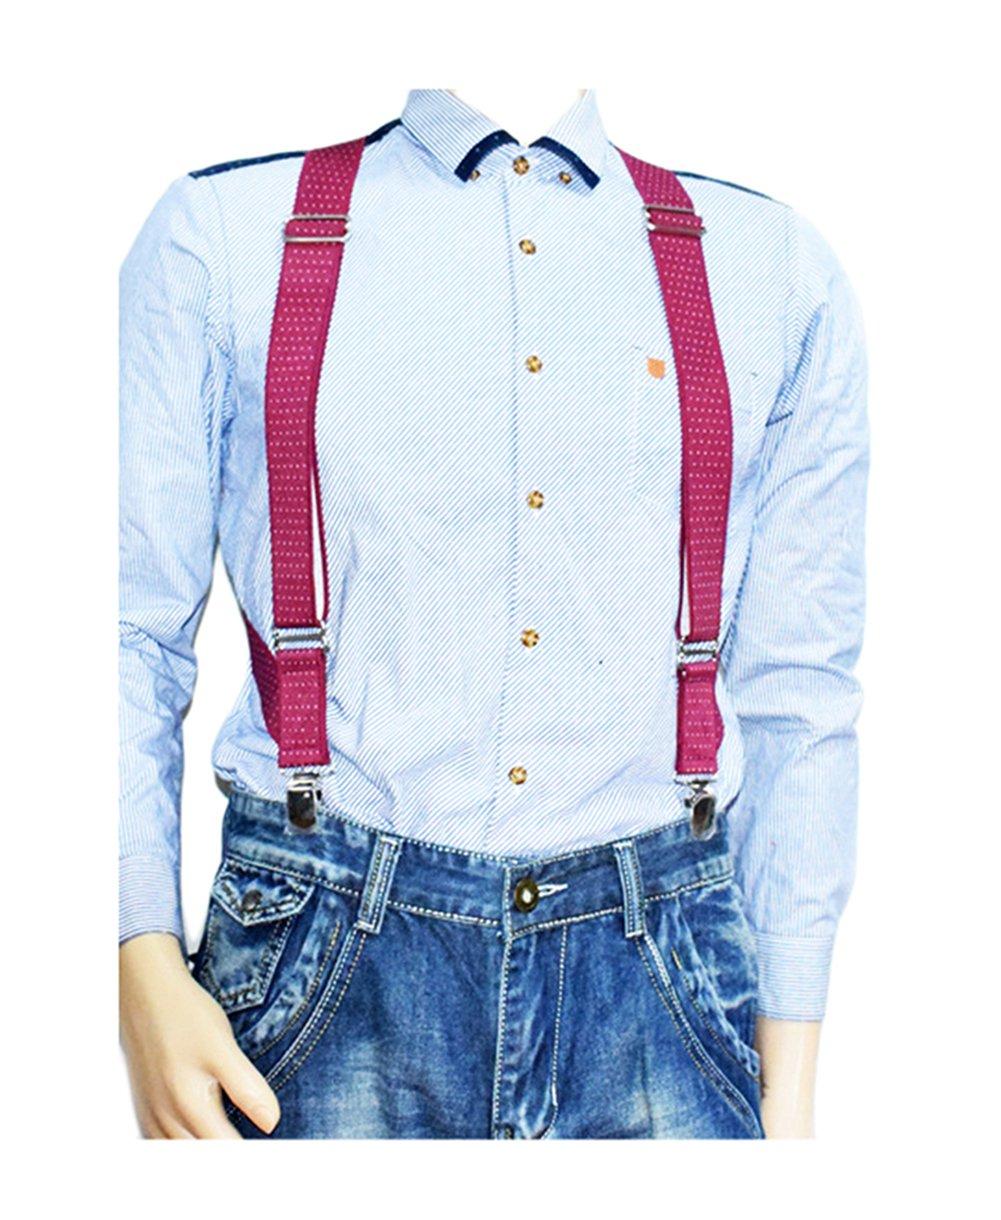 MENDENG Trucker Side Clip Suspenders Polka Dot No-slip Elastic Adjustable Braces by MENDENG